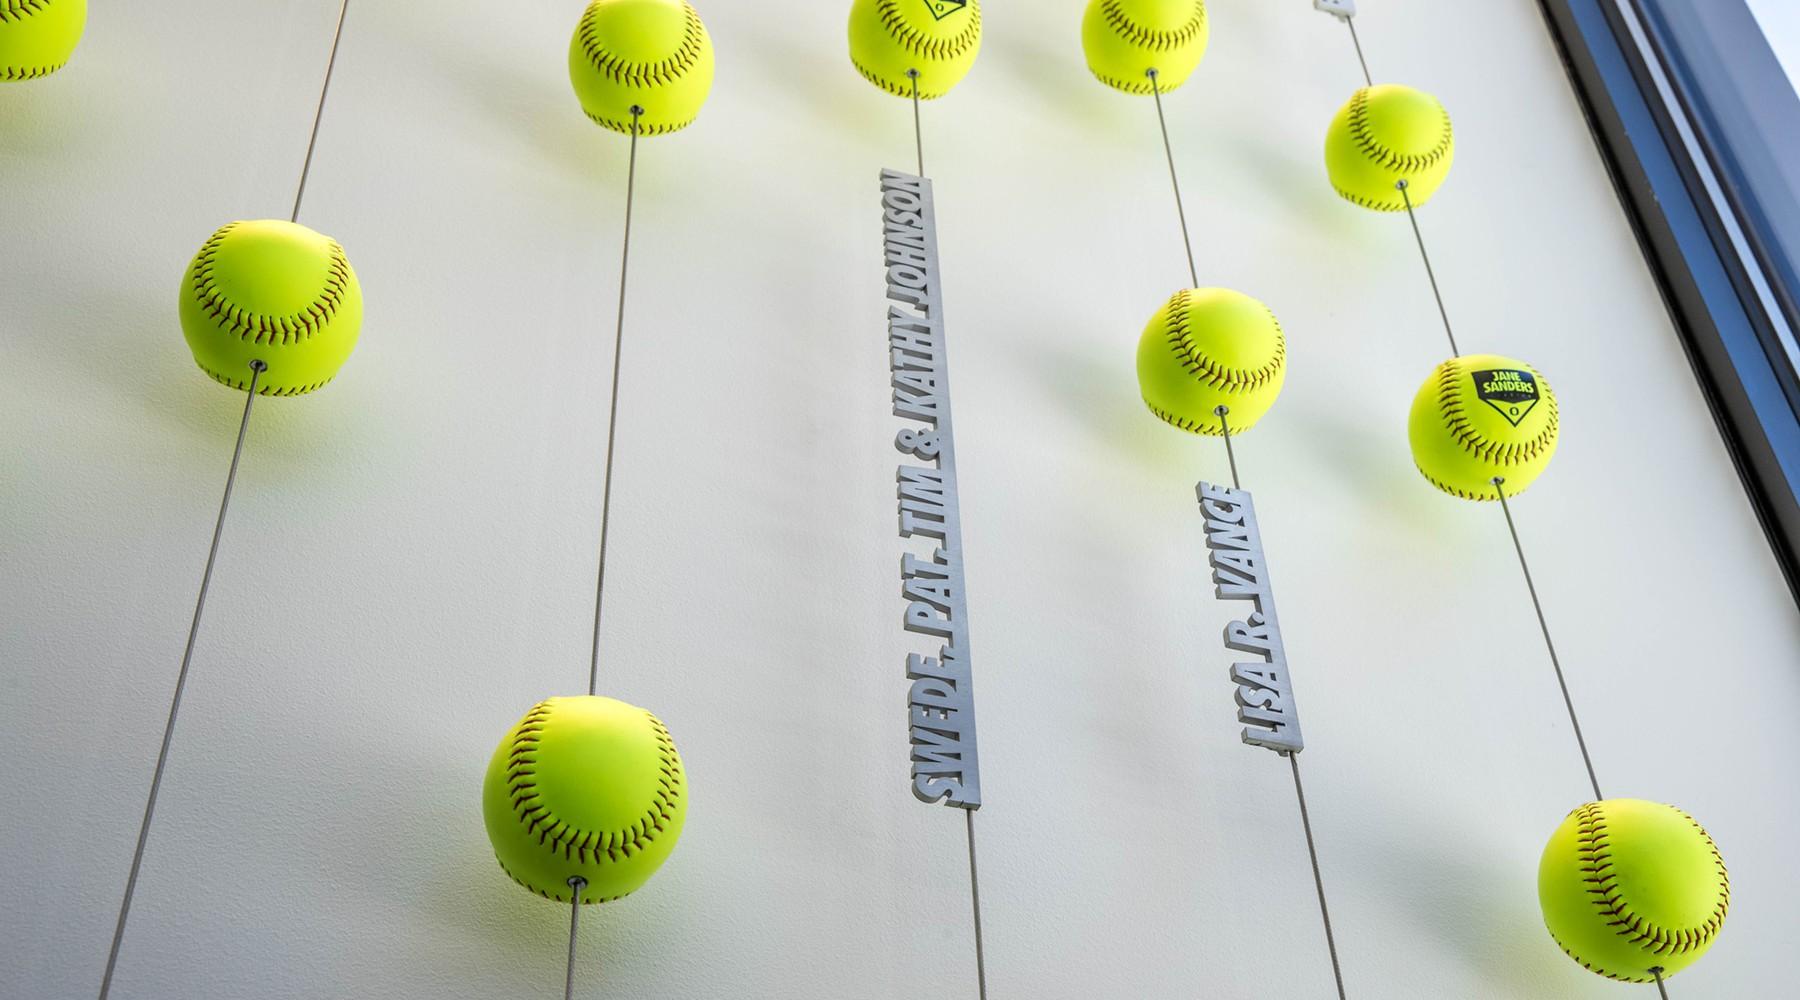 Softball display closeup